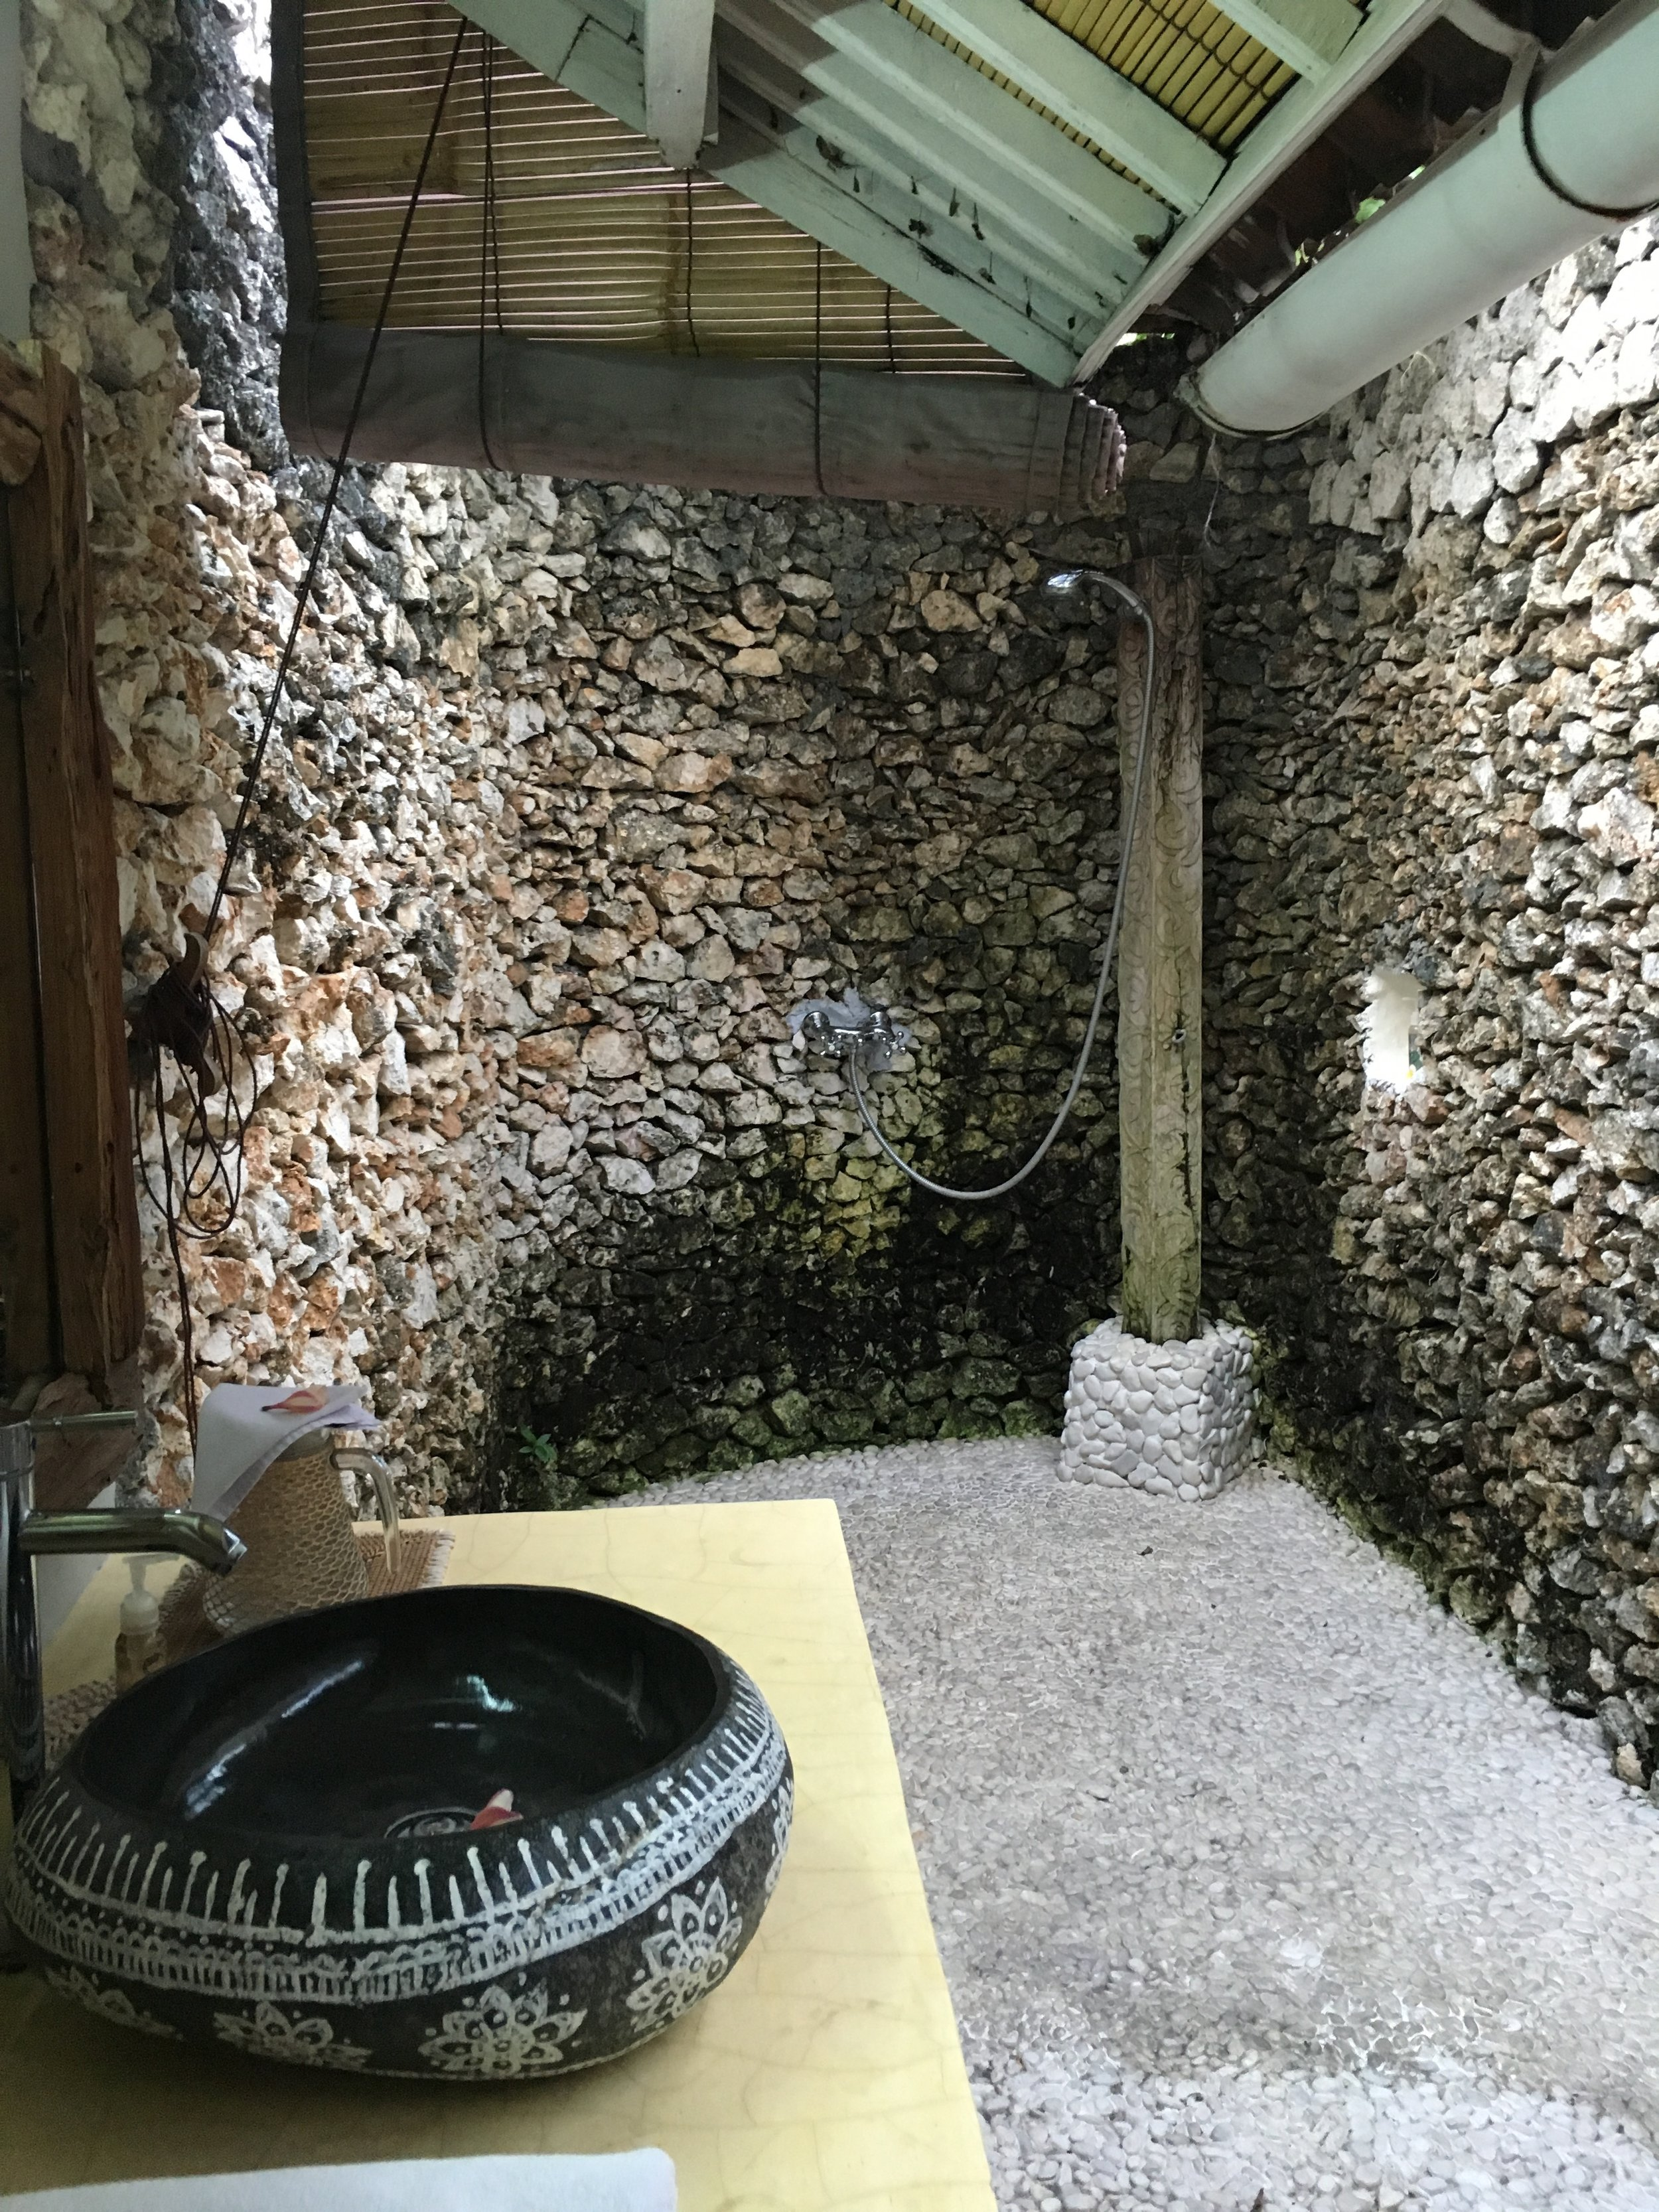 Outdoor rain shower